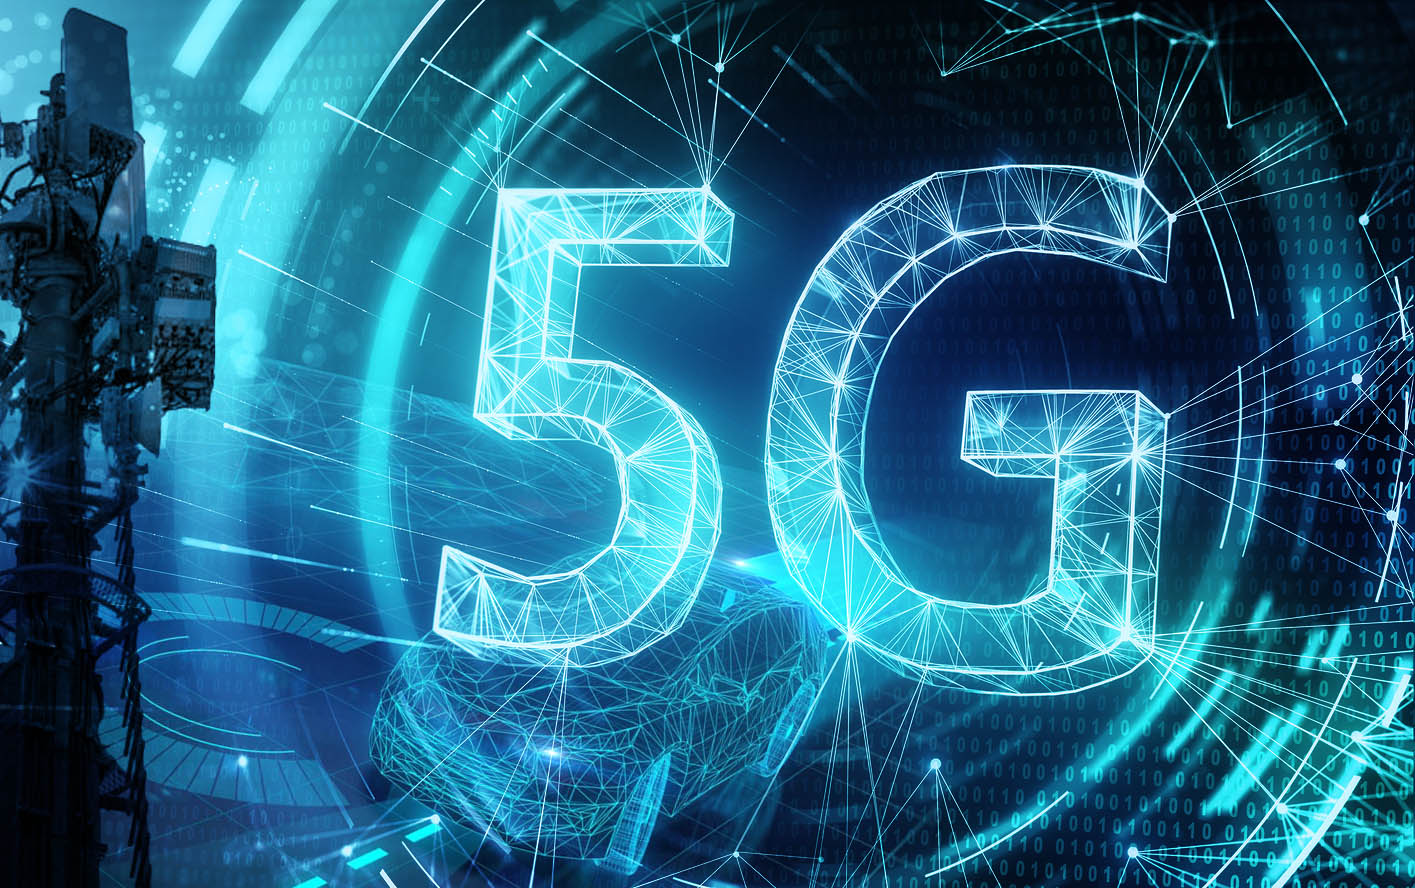 https://www.globbit.com/wp-content/uploads/2019/03/5G-antena-futuro-conectividad.jpg